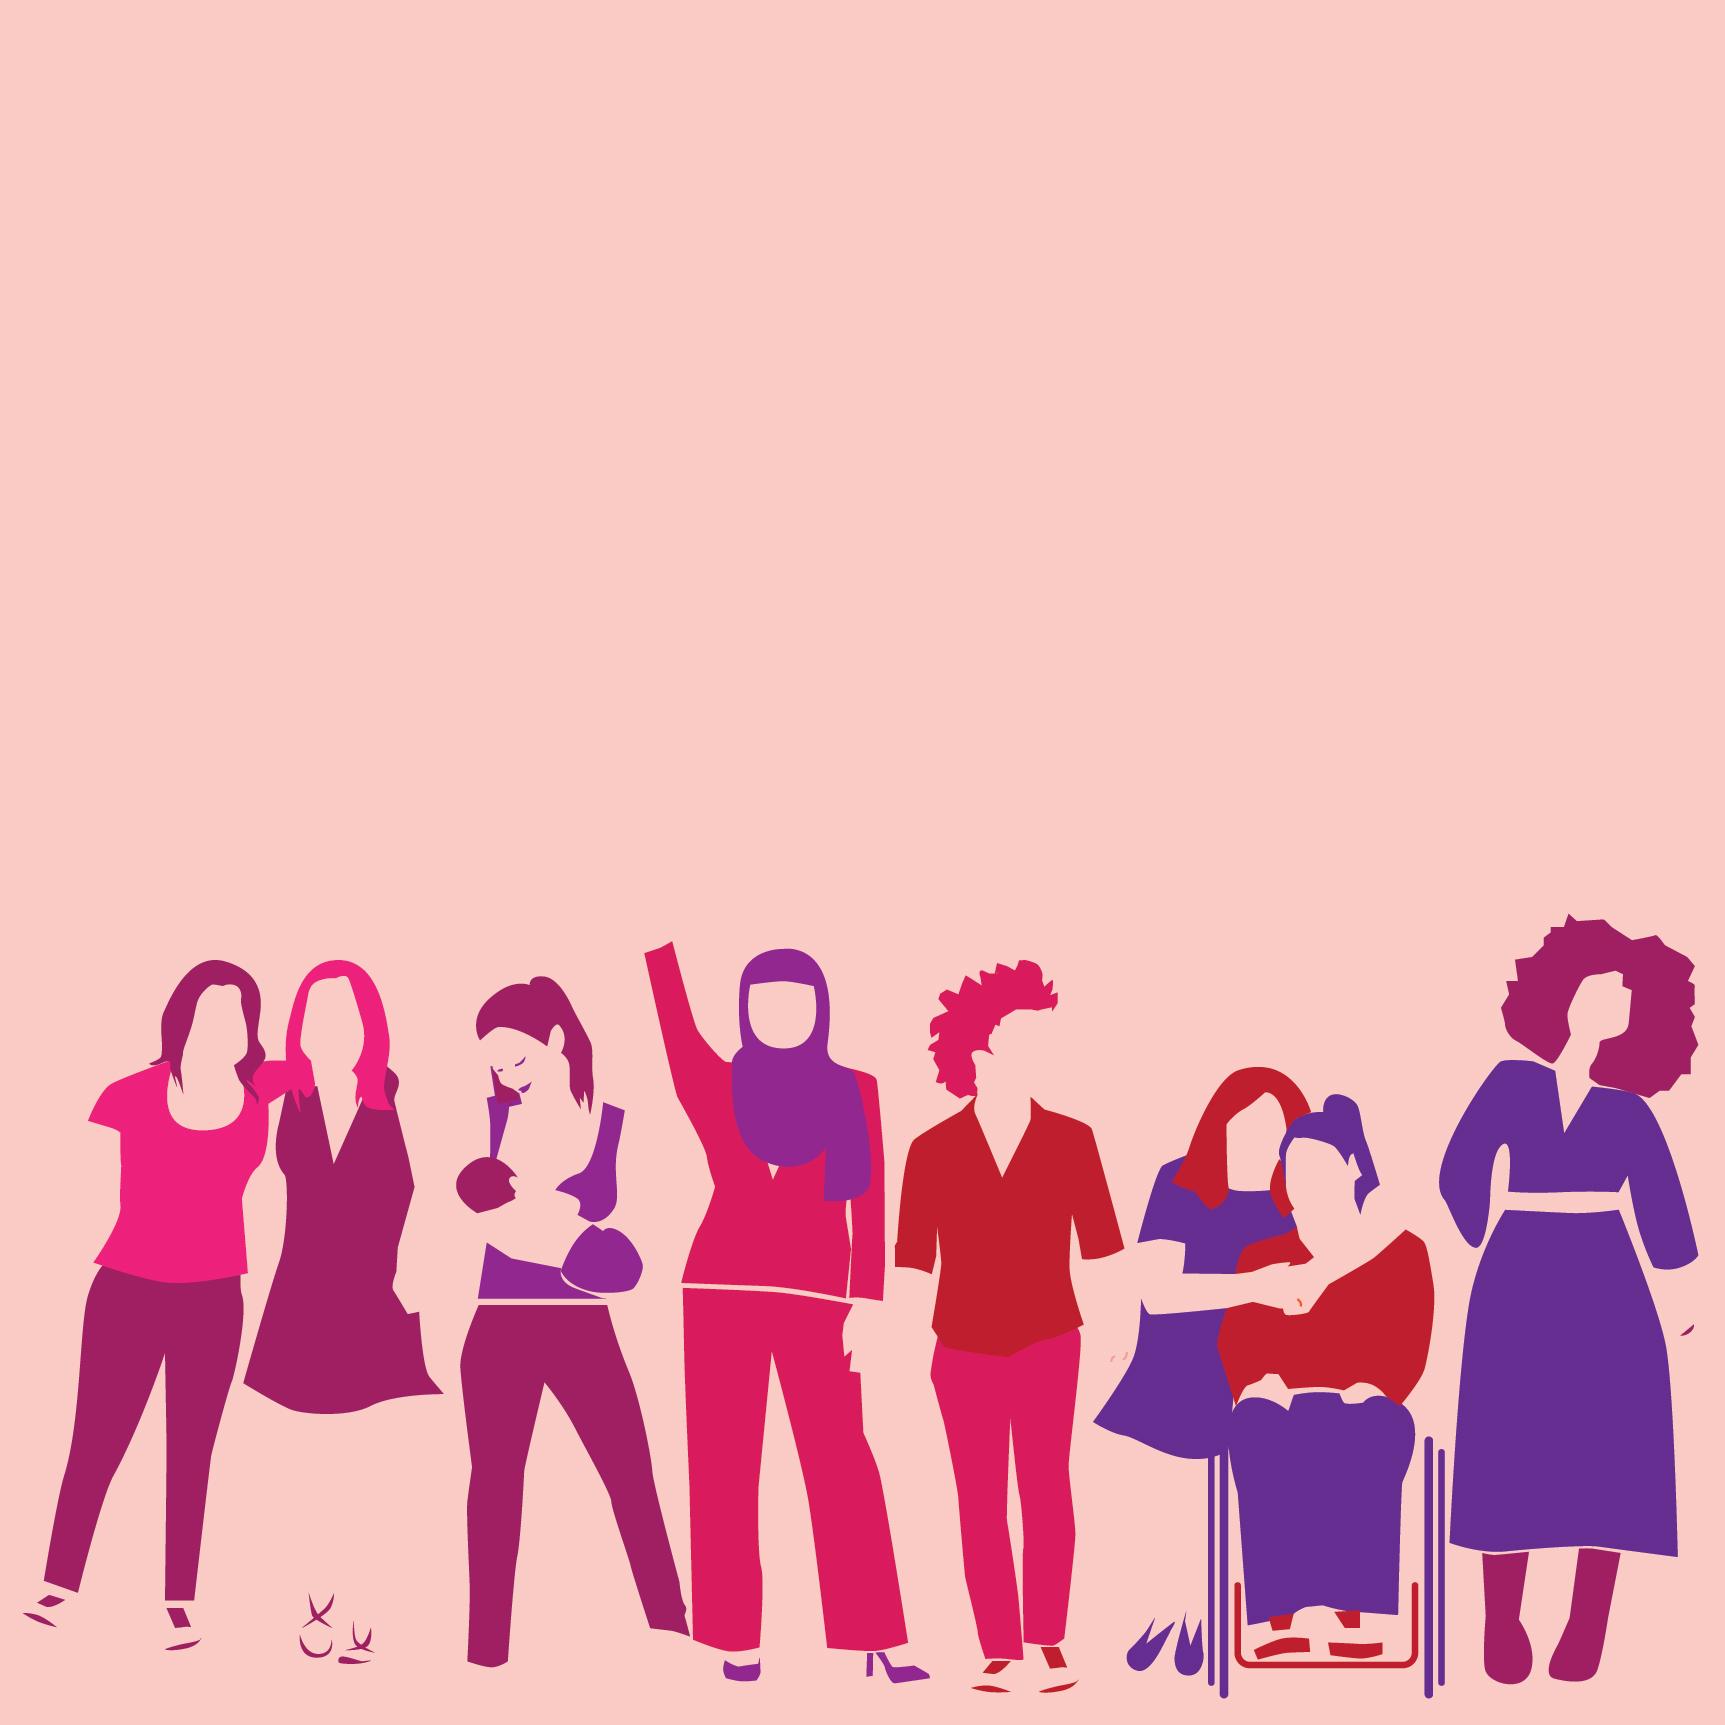 180308_Intl Womens Day-01.jpg